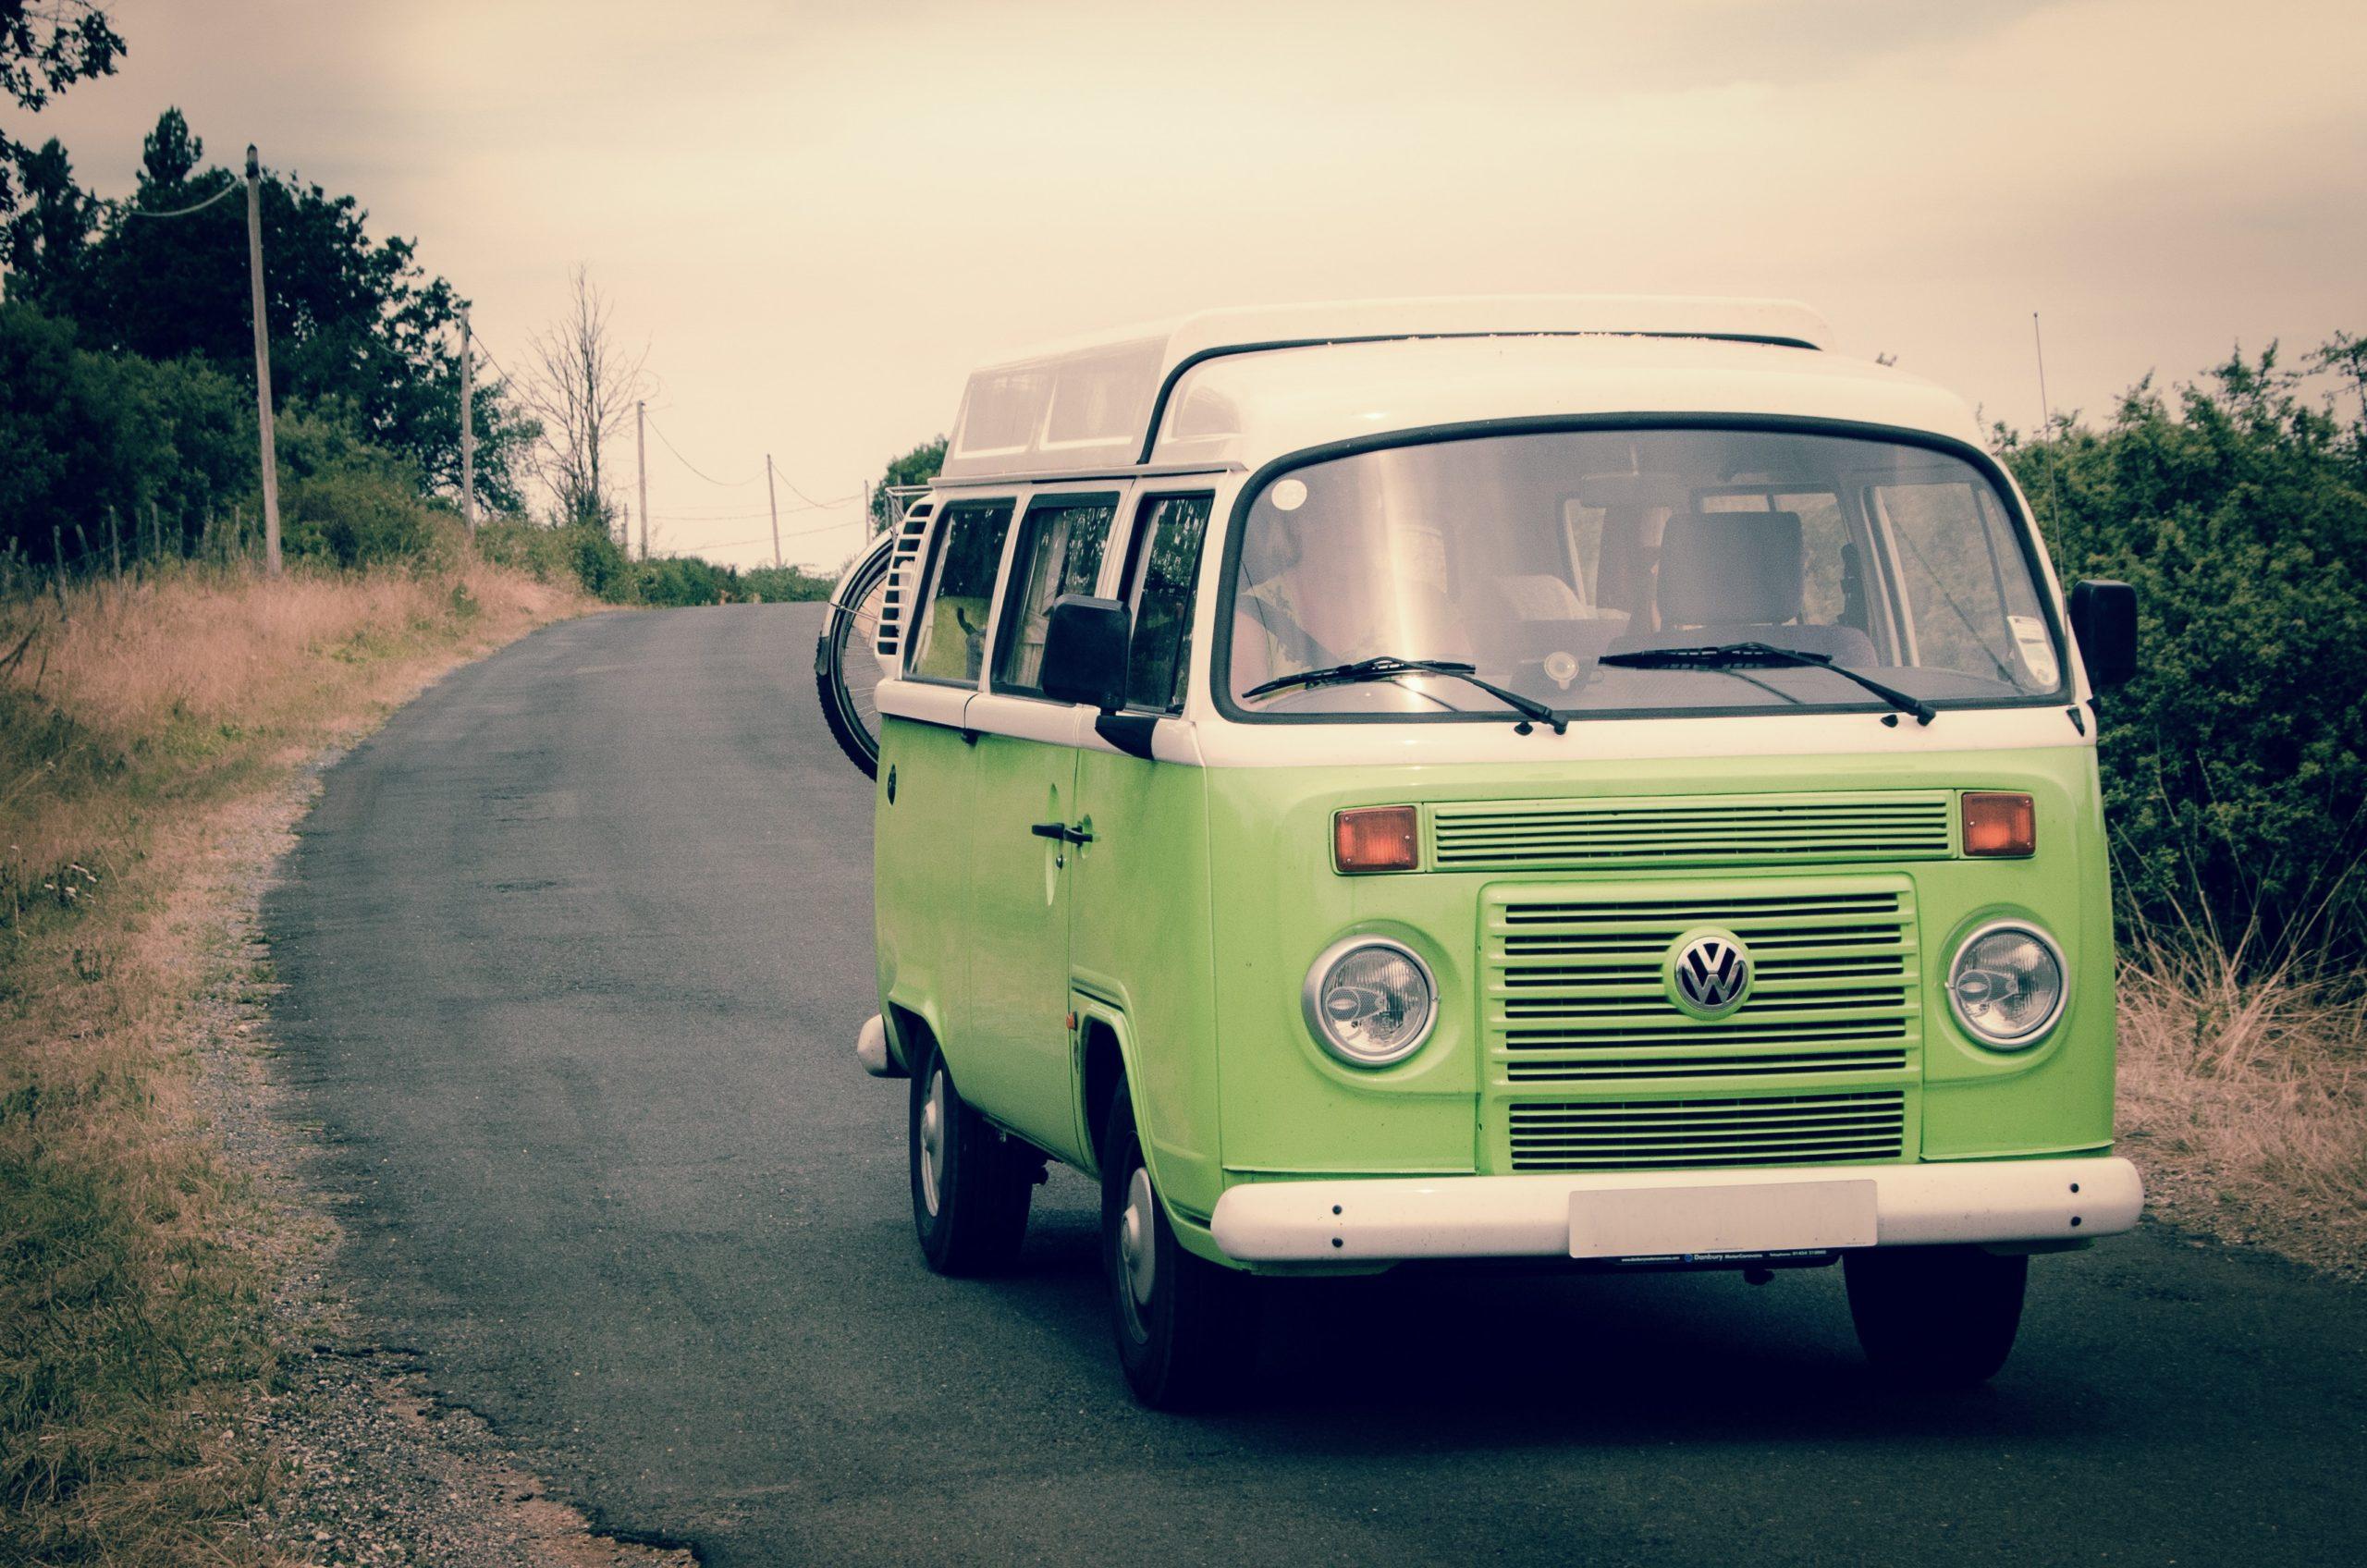 green-and-white-volkswagen-combi